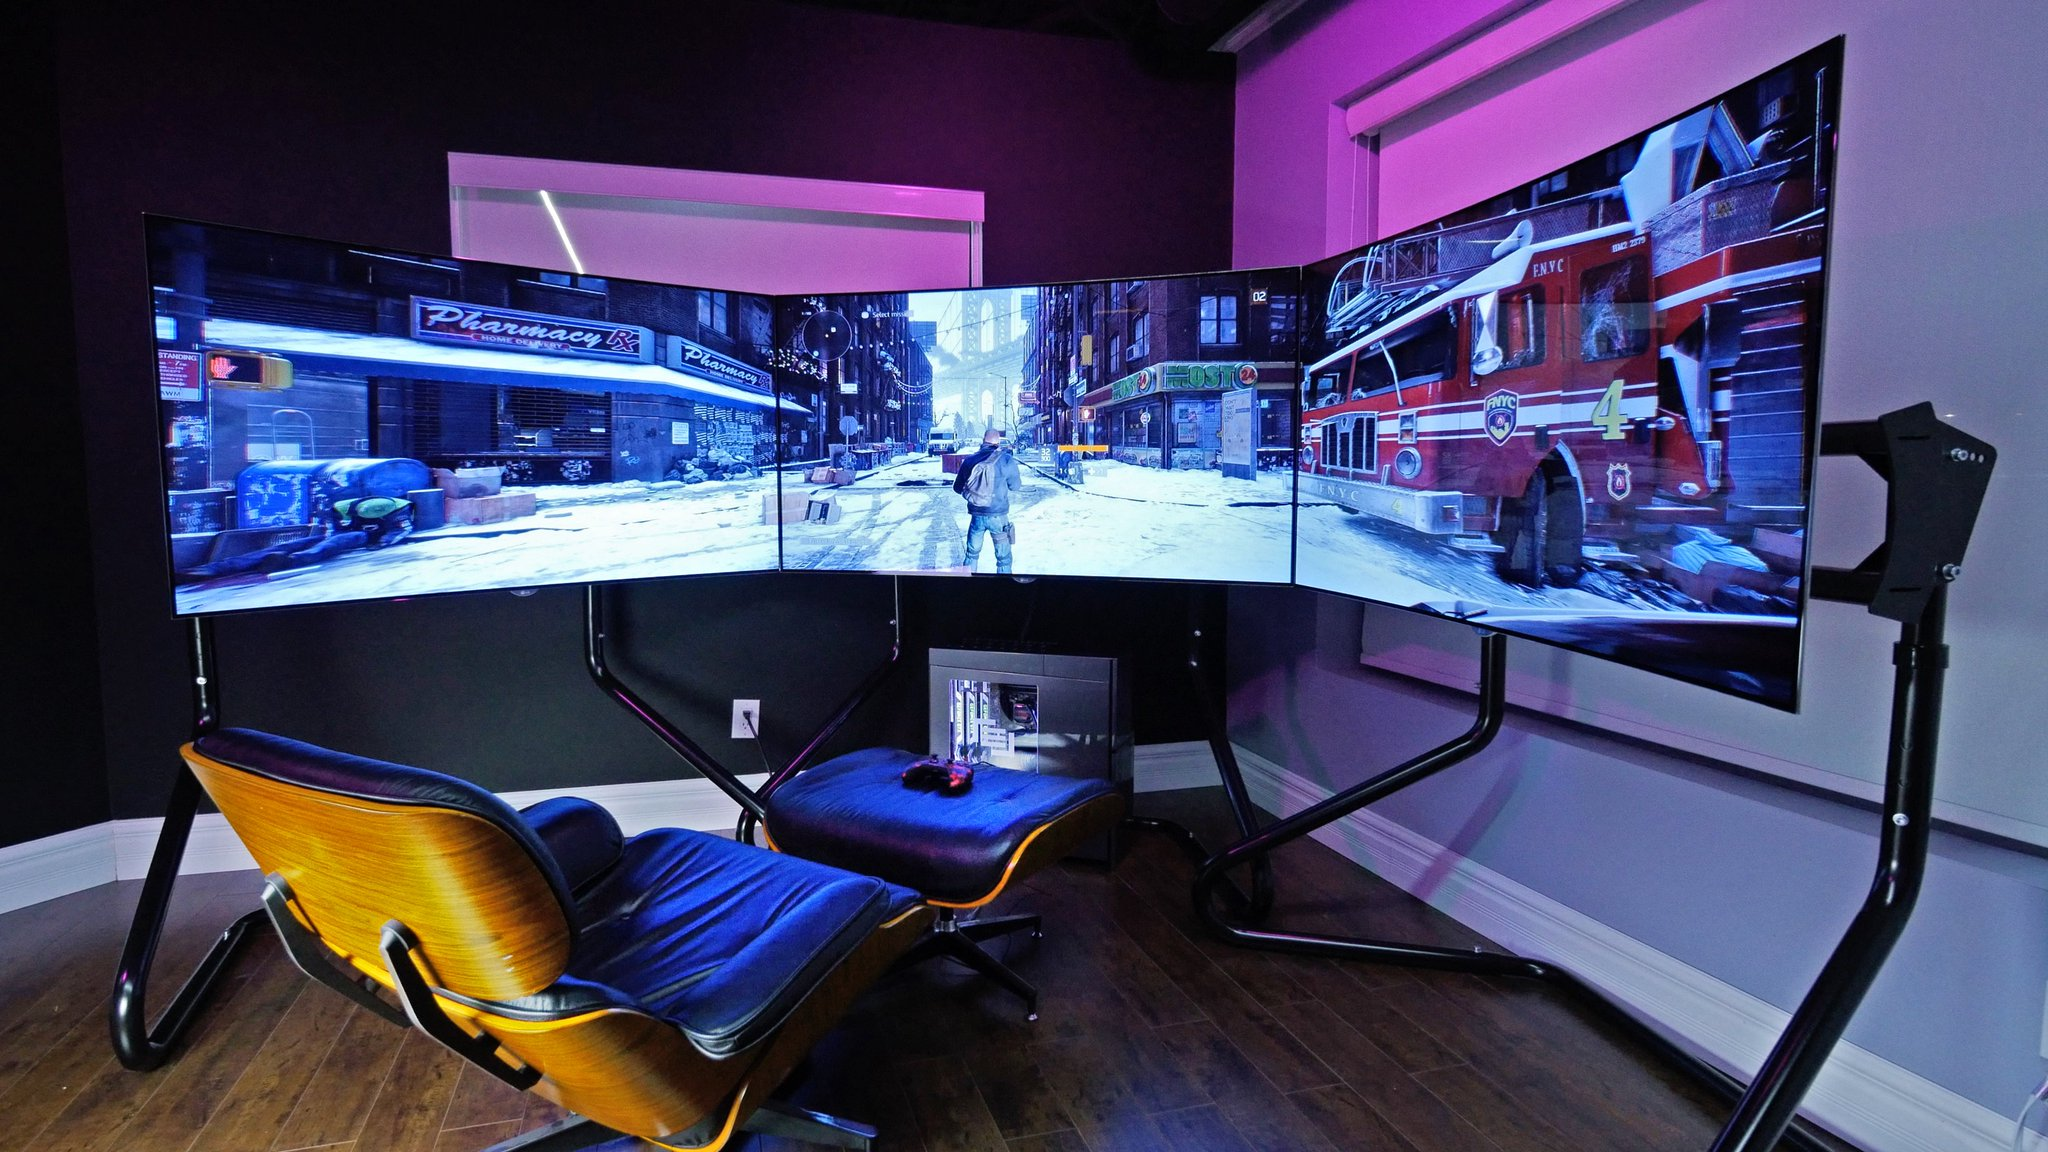 Lewis hilsenteger on twitter new video ultimate gaming for Pc de salon gamer